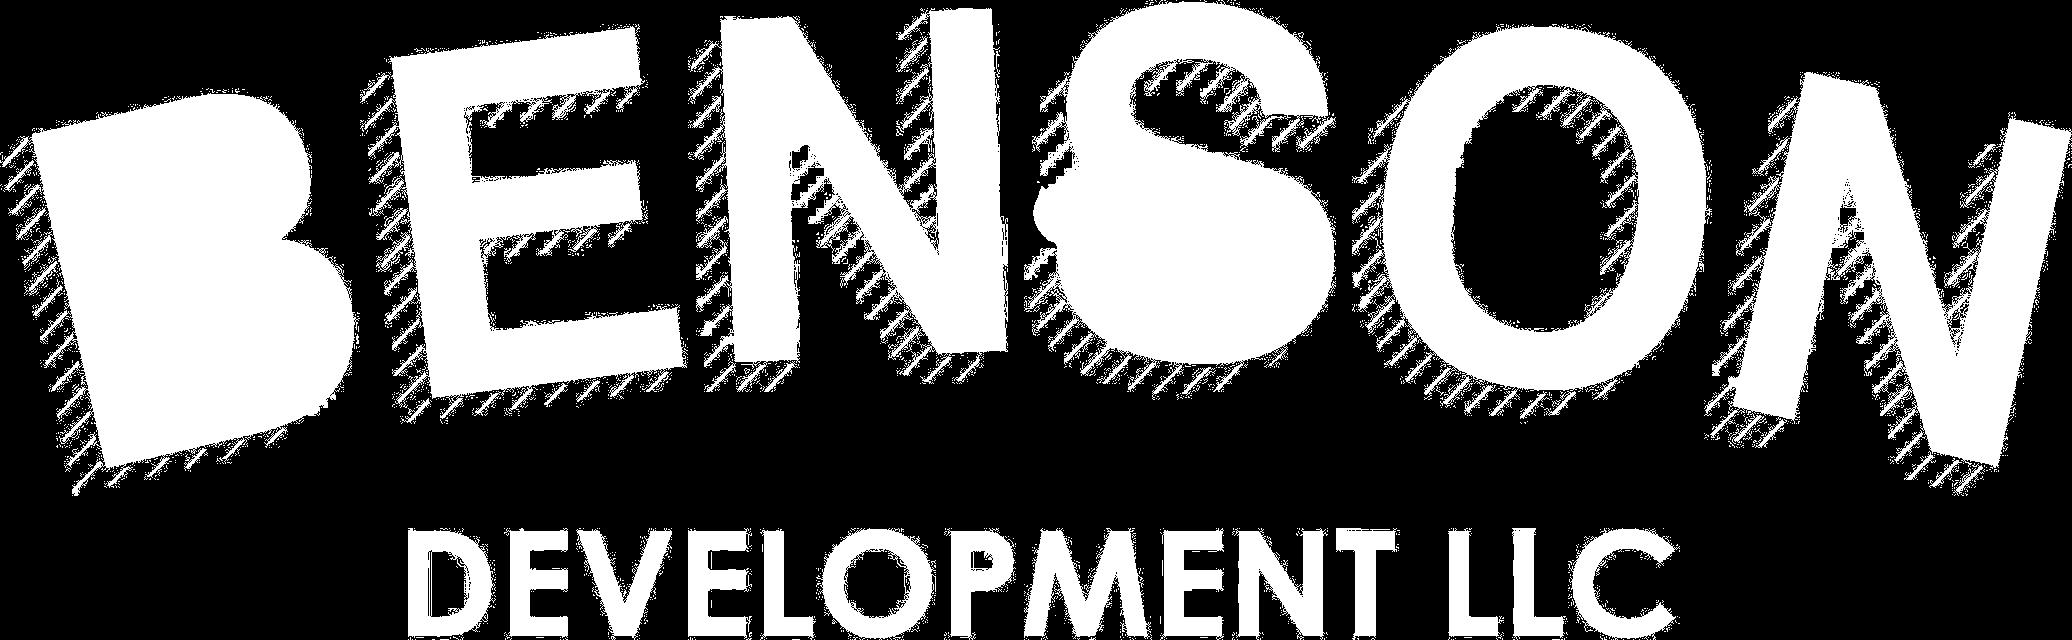 Benson Development LLC Staging